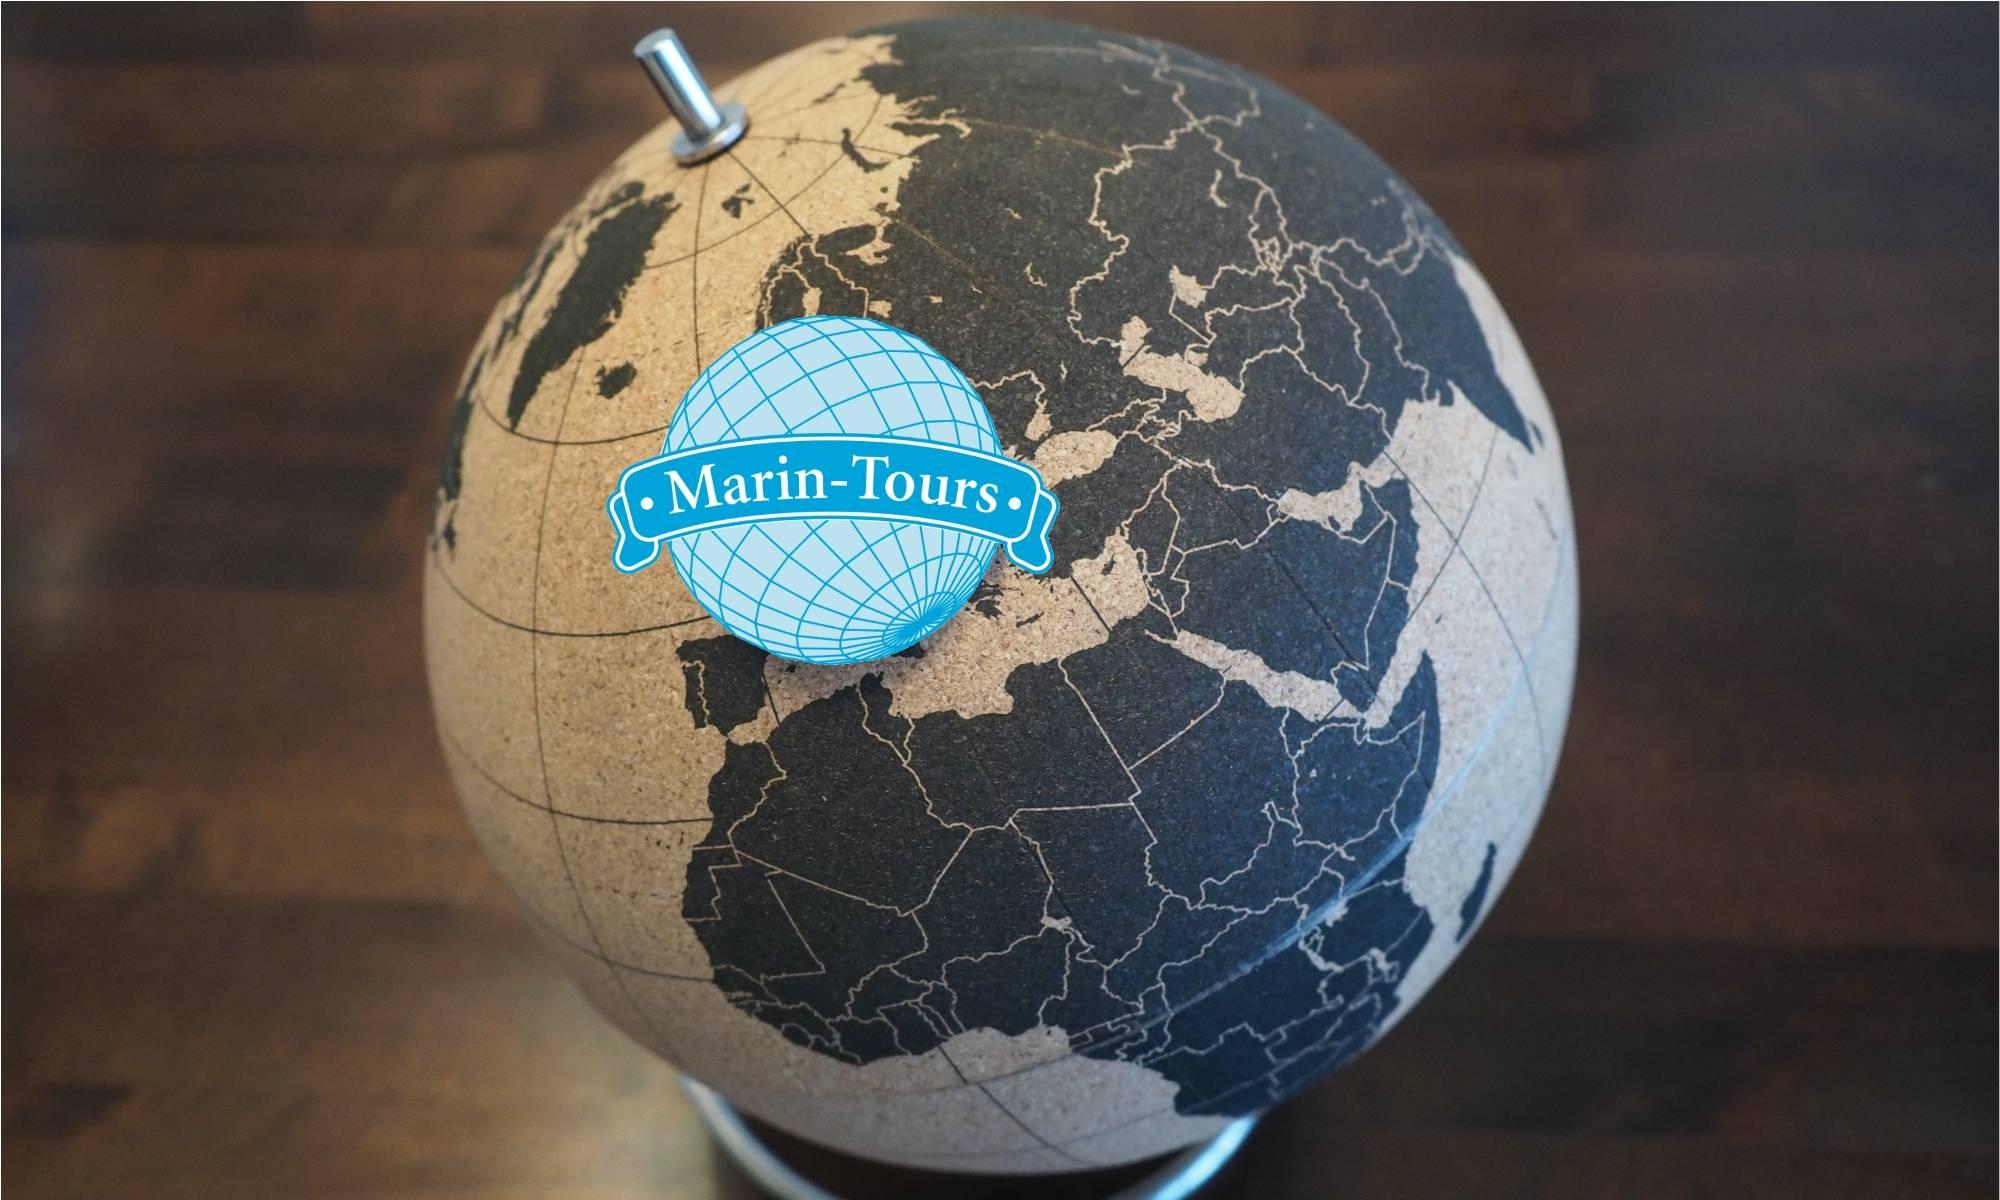 Marin-Tours